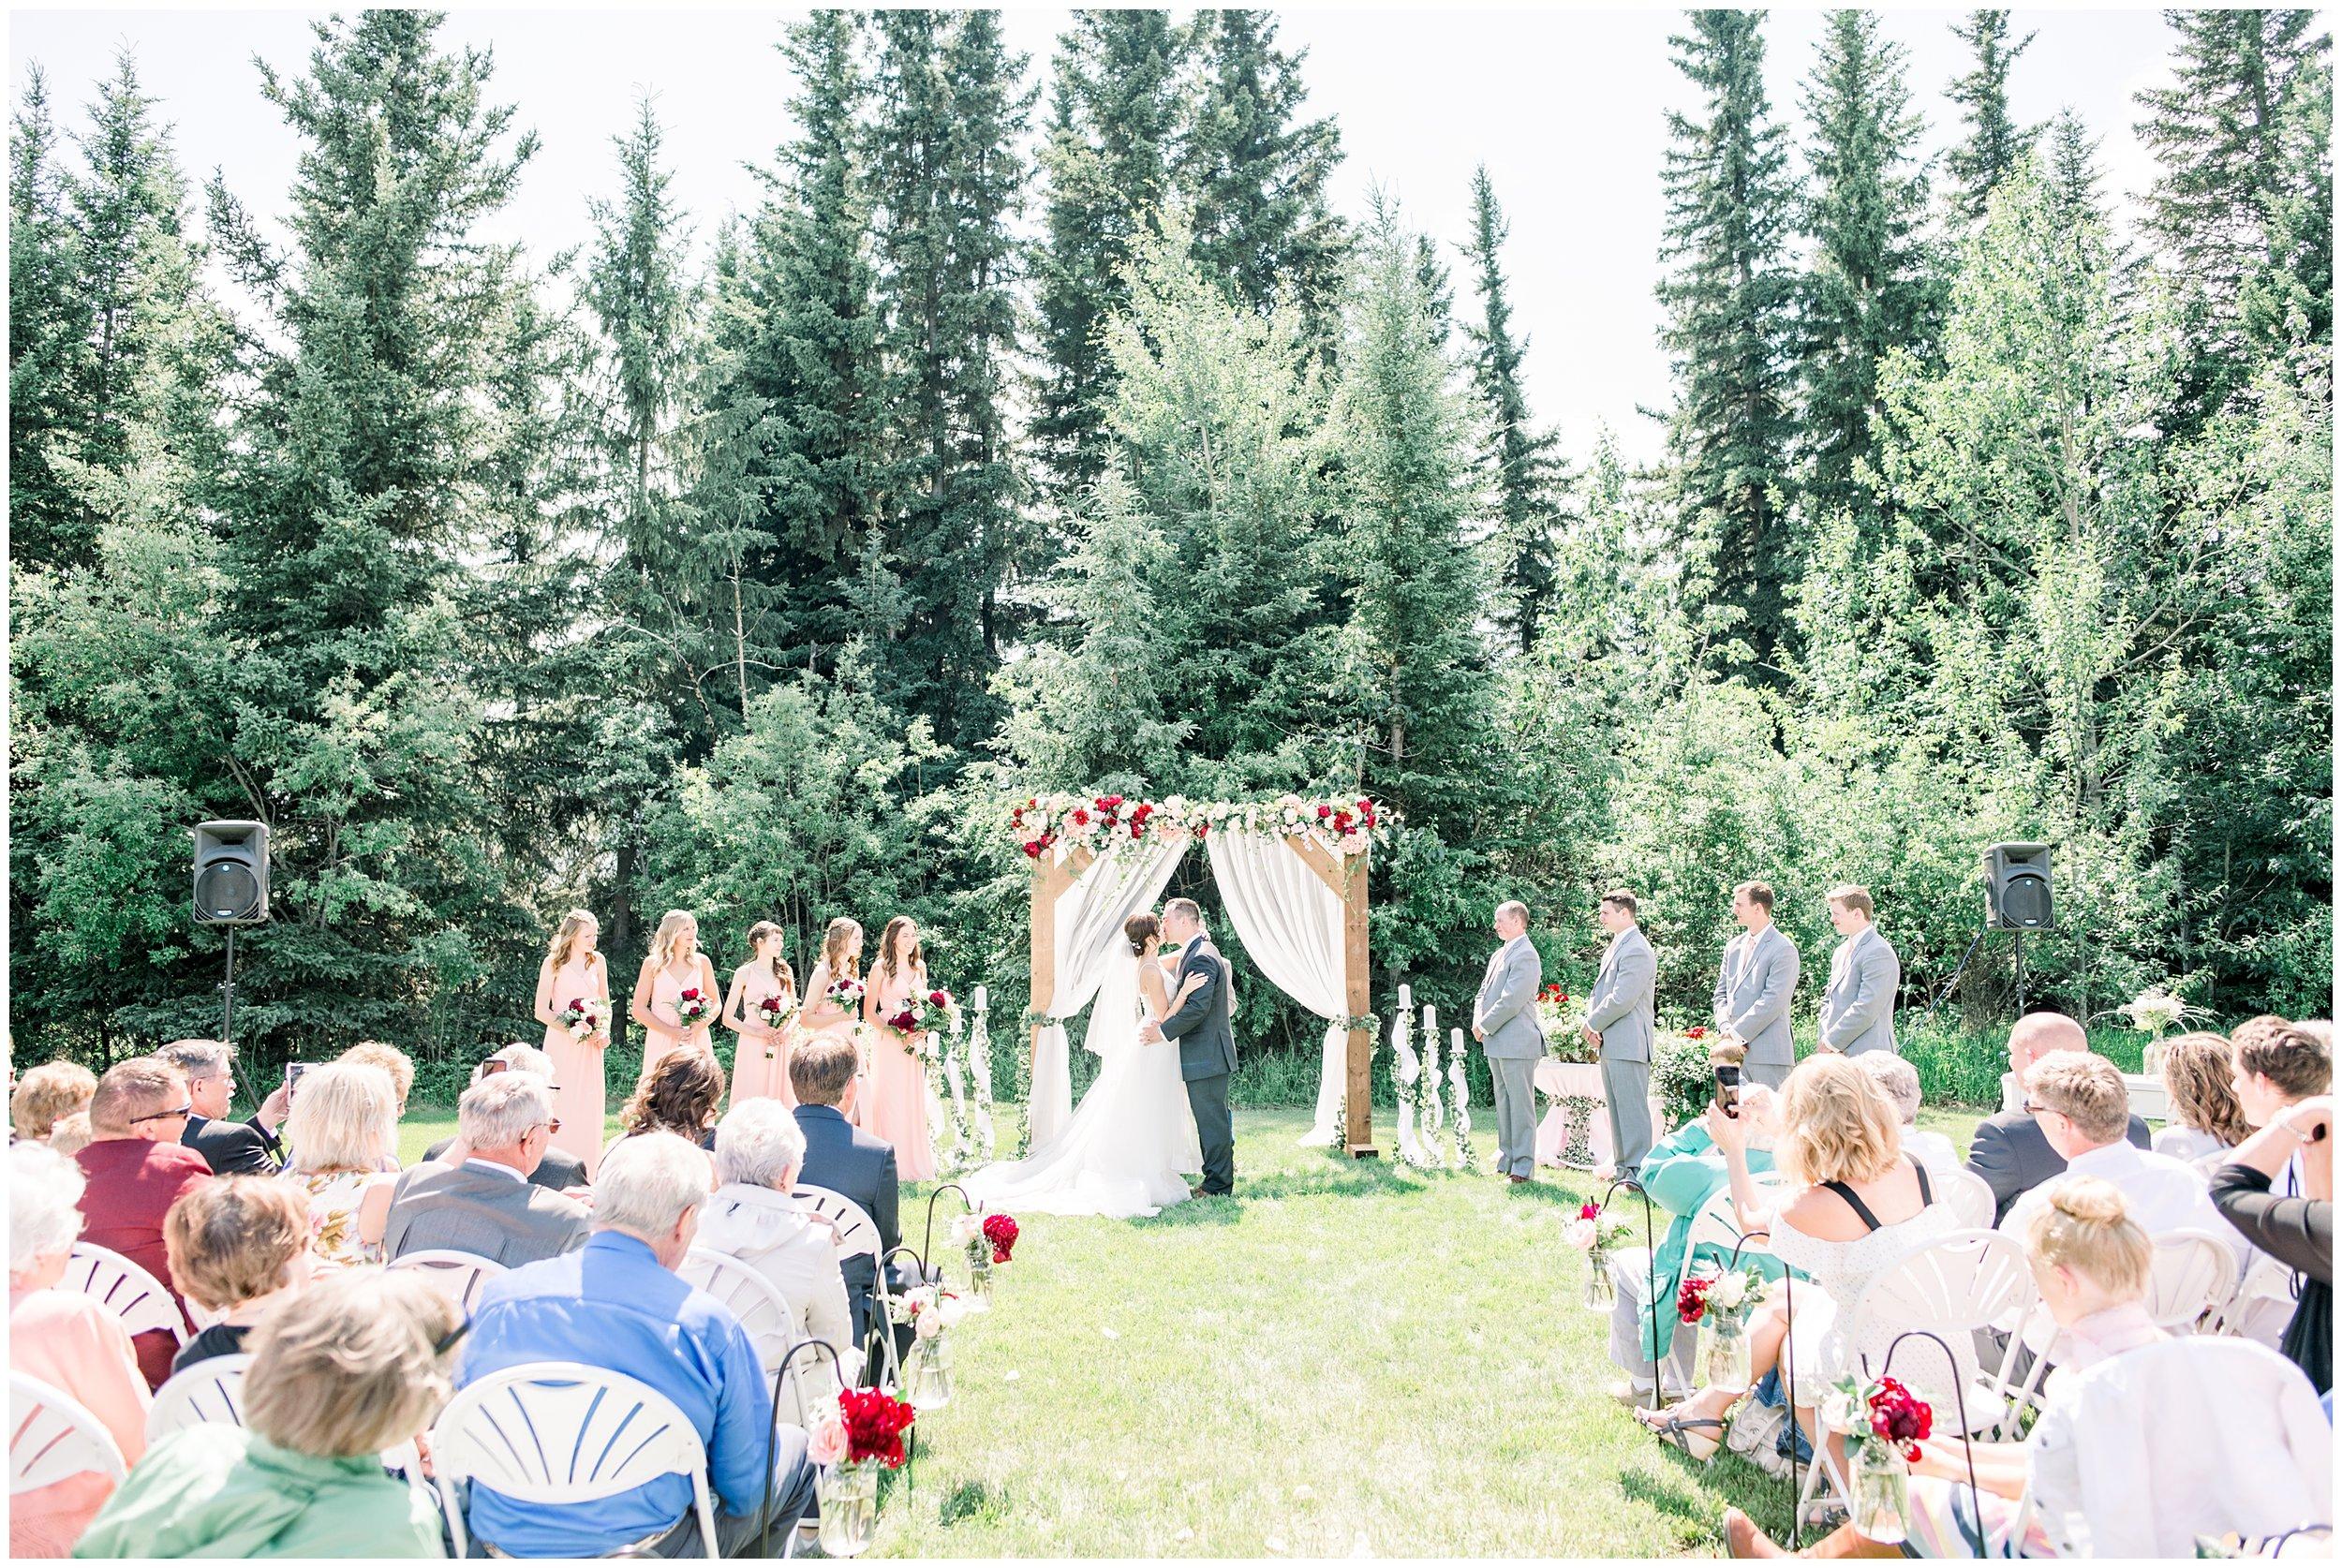 Alyssa-Poland-Photography_0623_alberta wedding.jpg